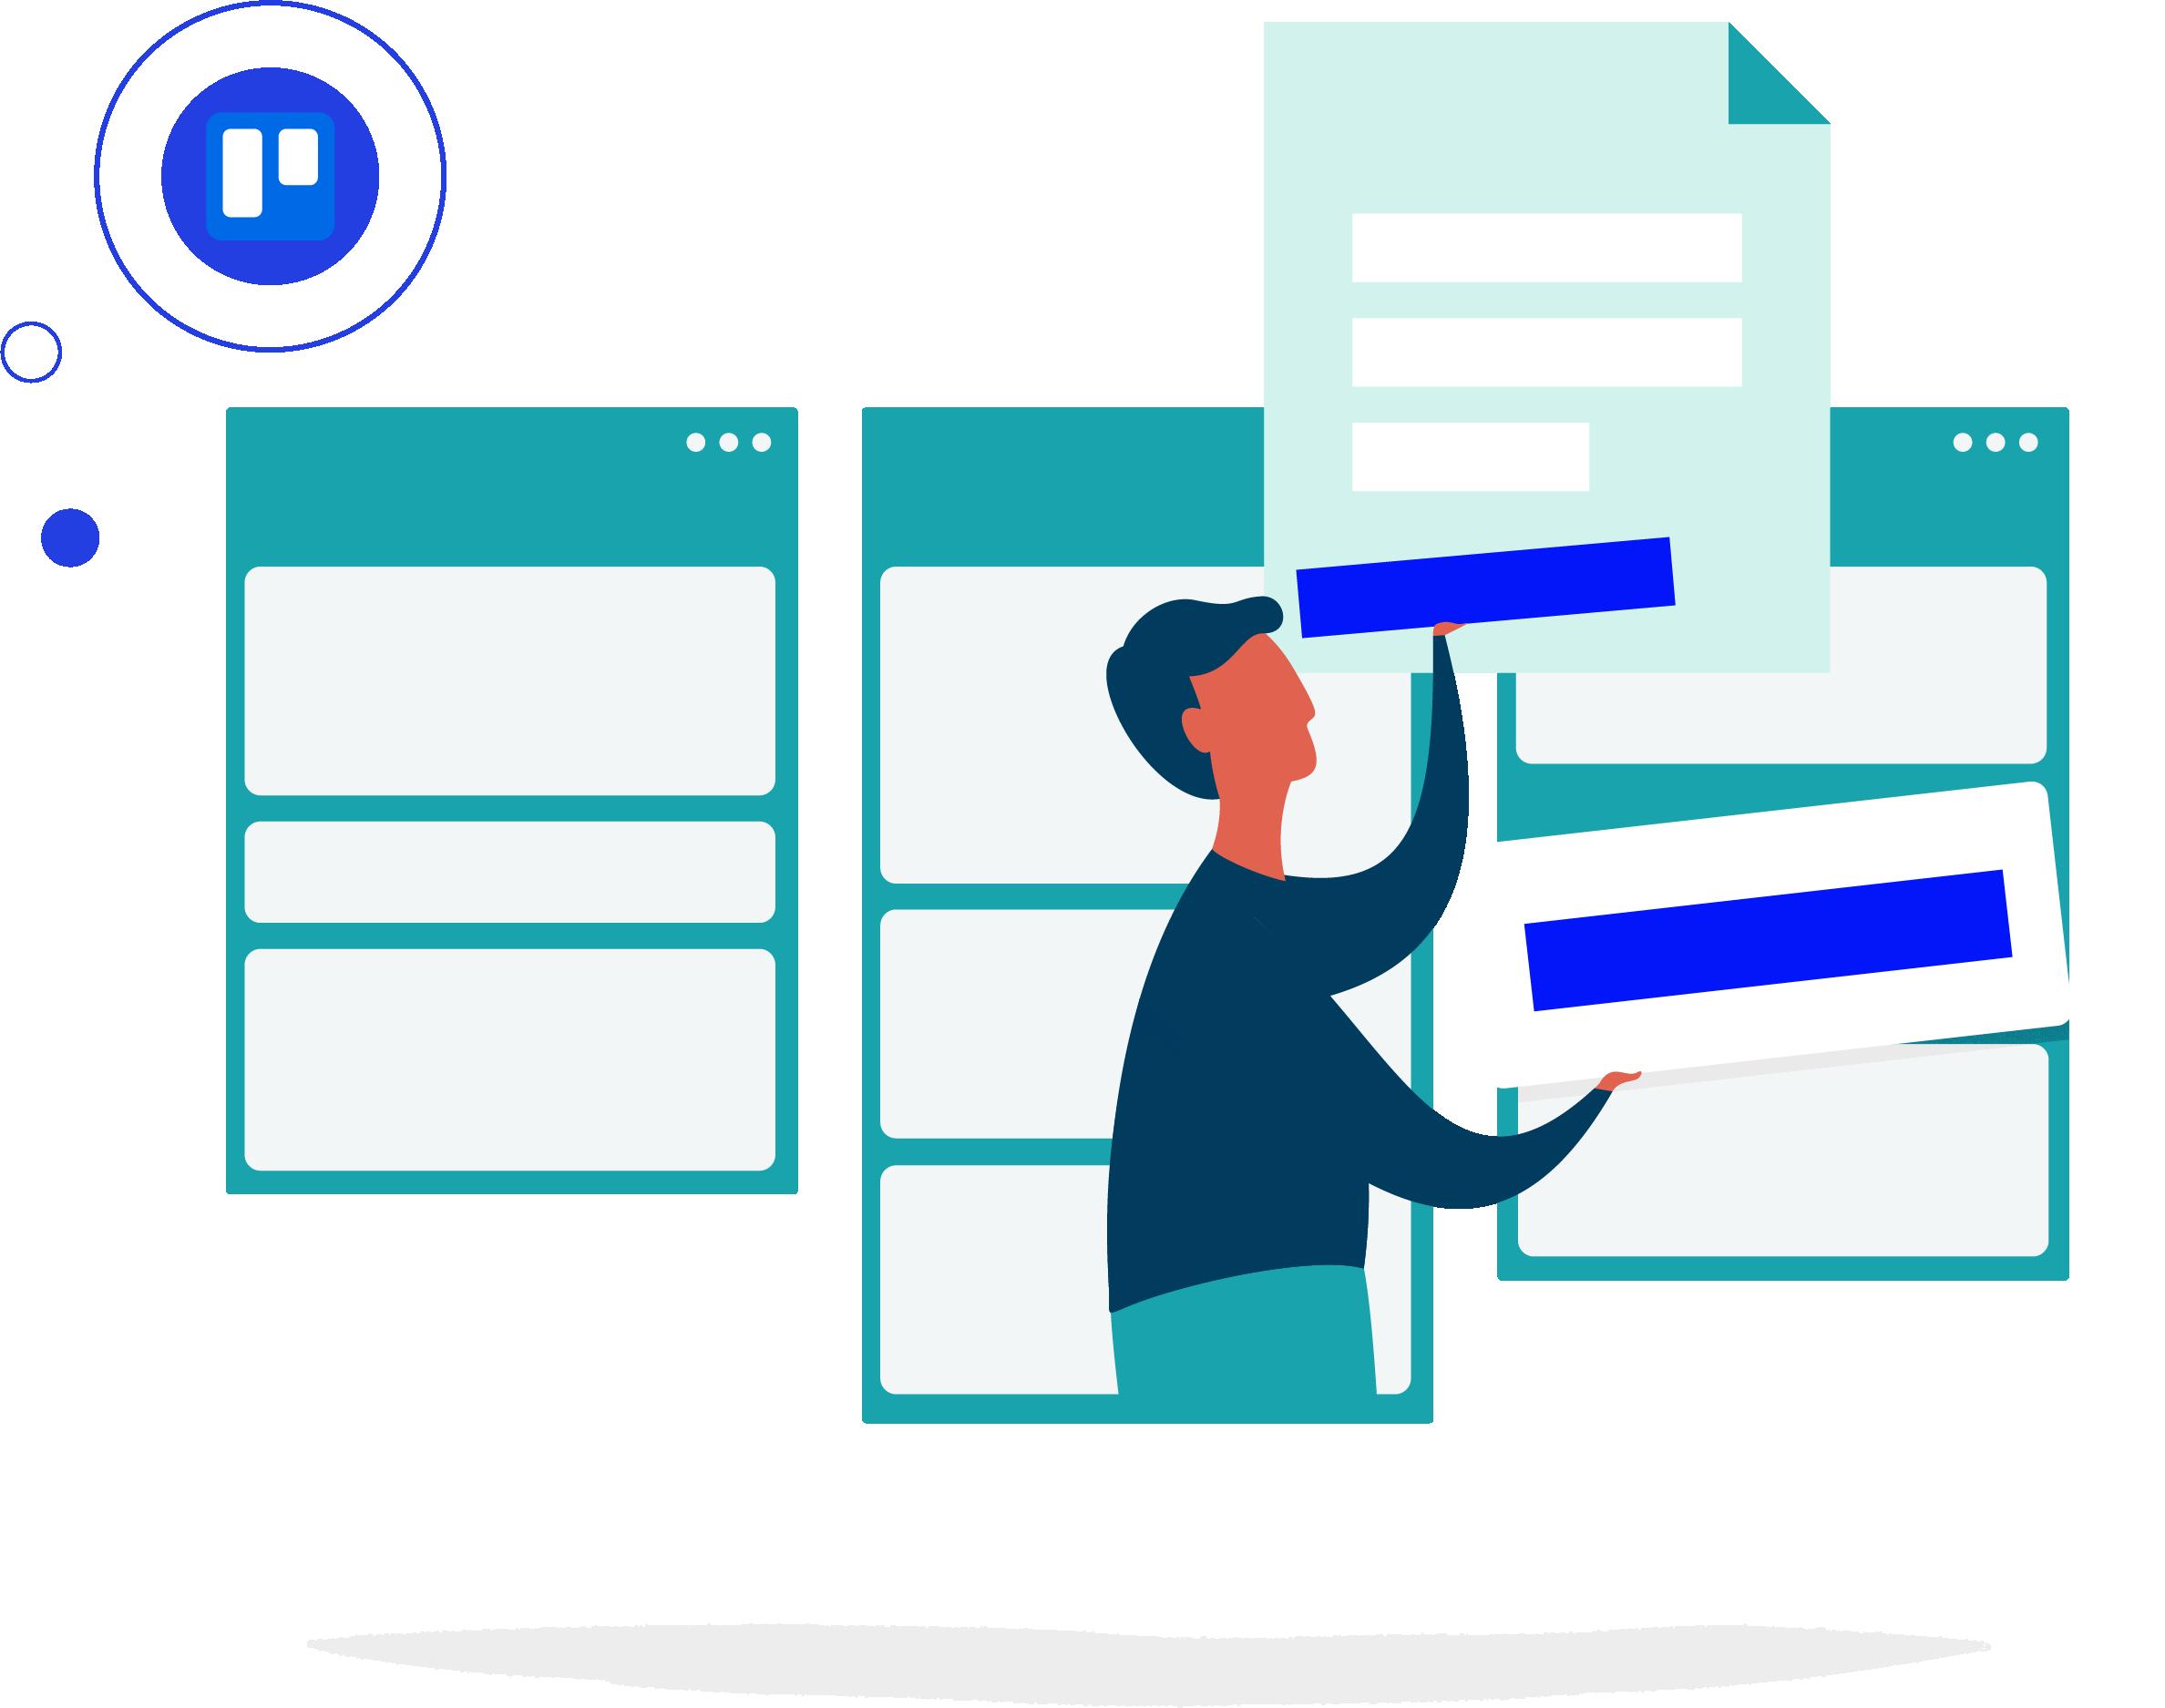 Meeting workflow illustration